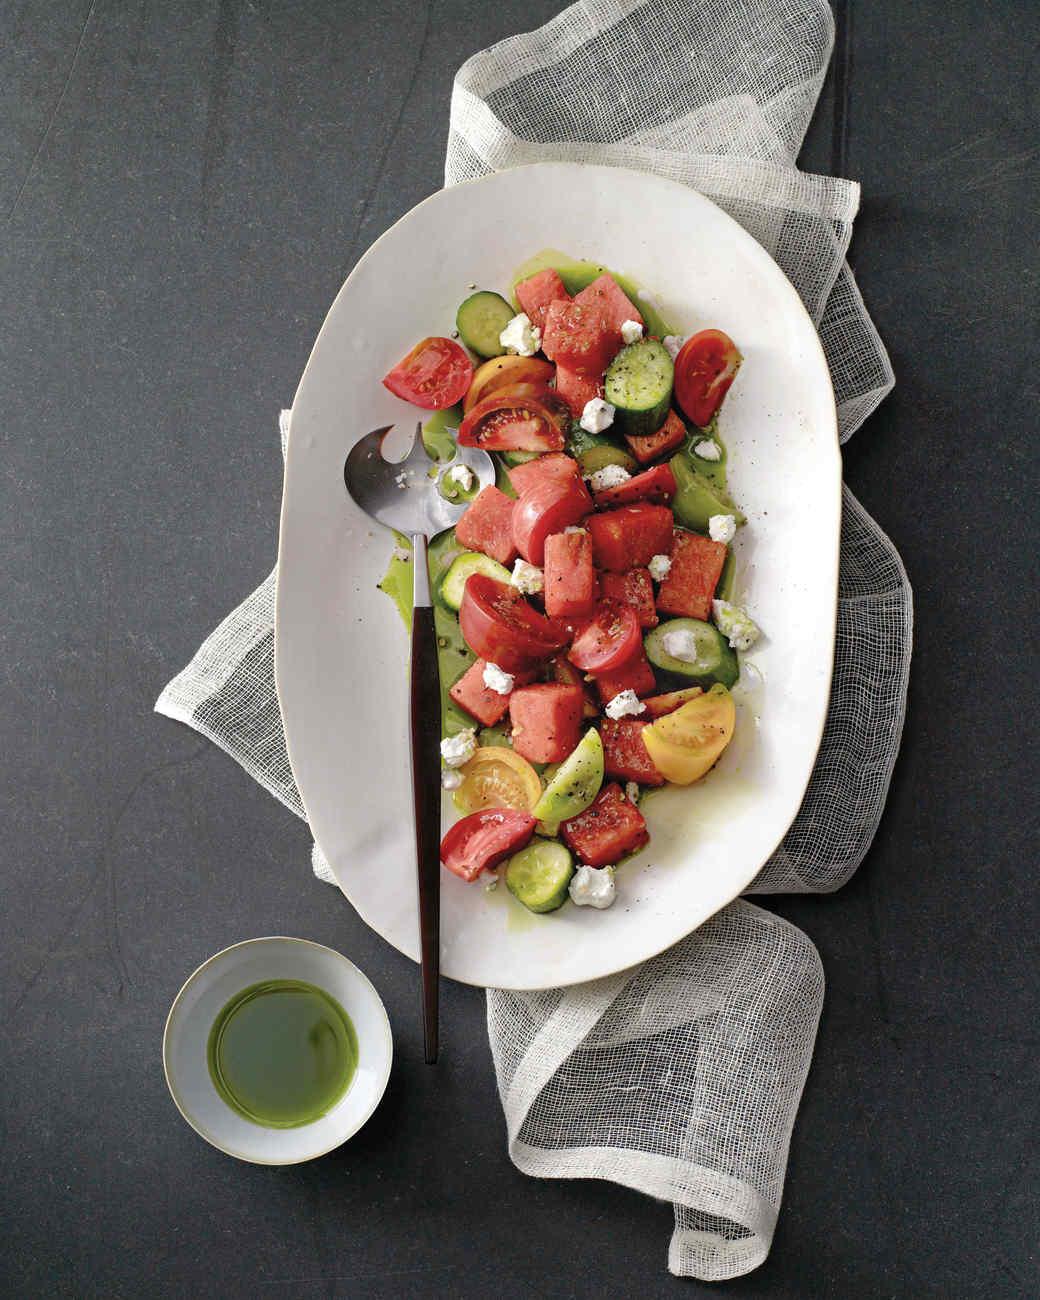 watermelon-tomato-salad-0811mld104304.jpg